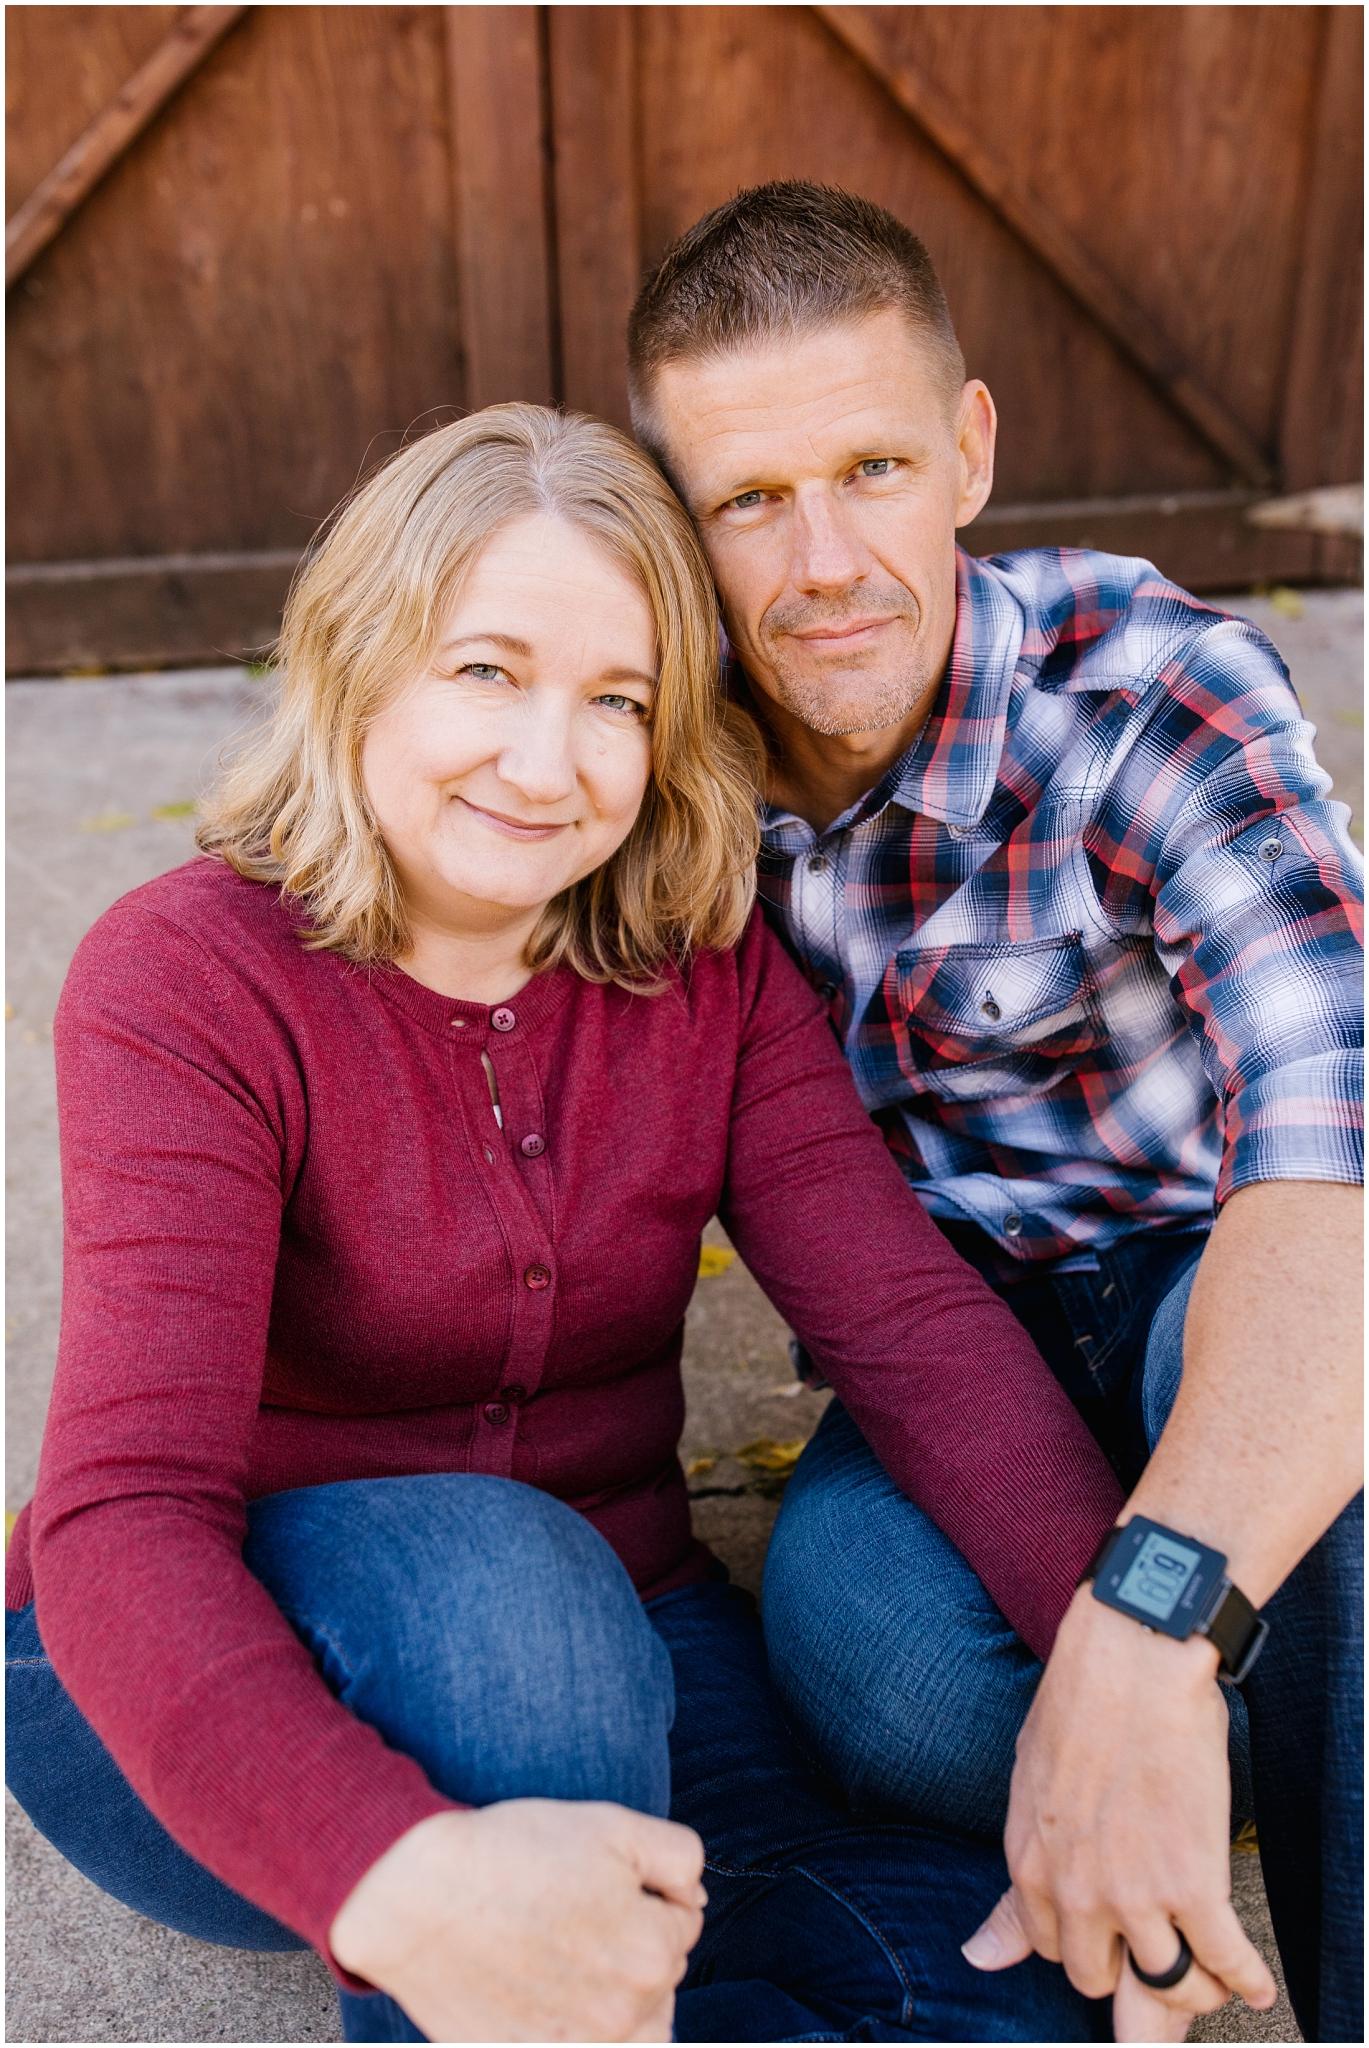 Nielsen--73_Lizzie-B-Imagery-Utah-Family-Photographer-Park-City-Salt-Lake-City-Hobble-Creek-Canyon-Jolleys-Ranch.jpg